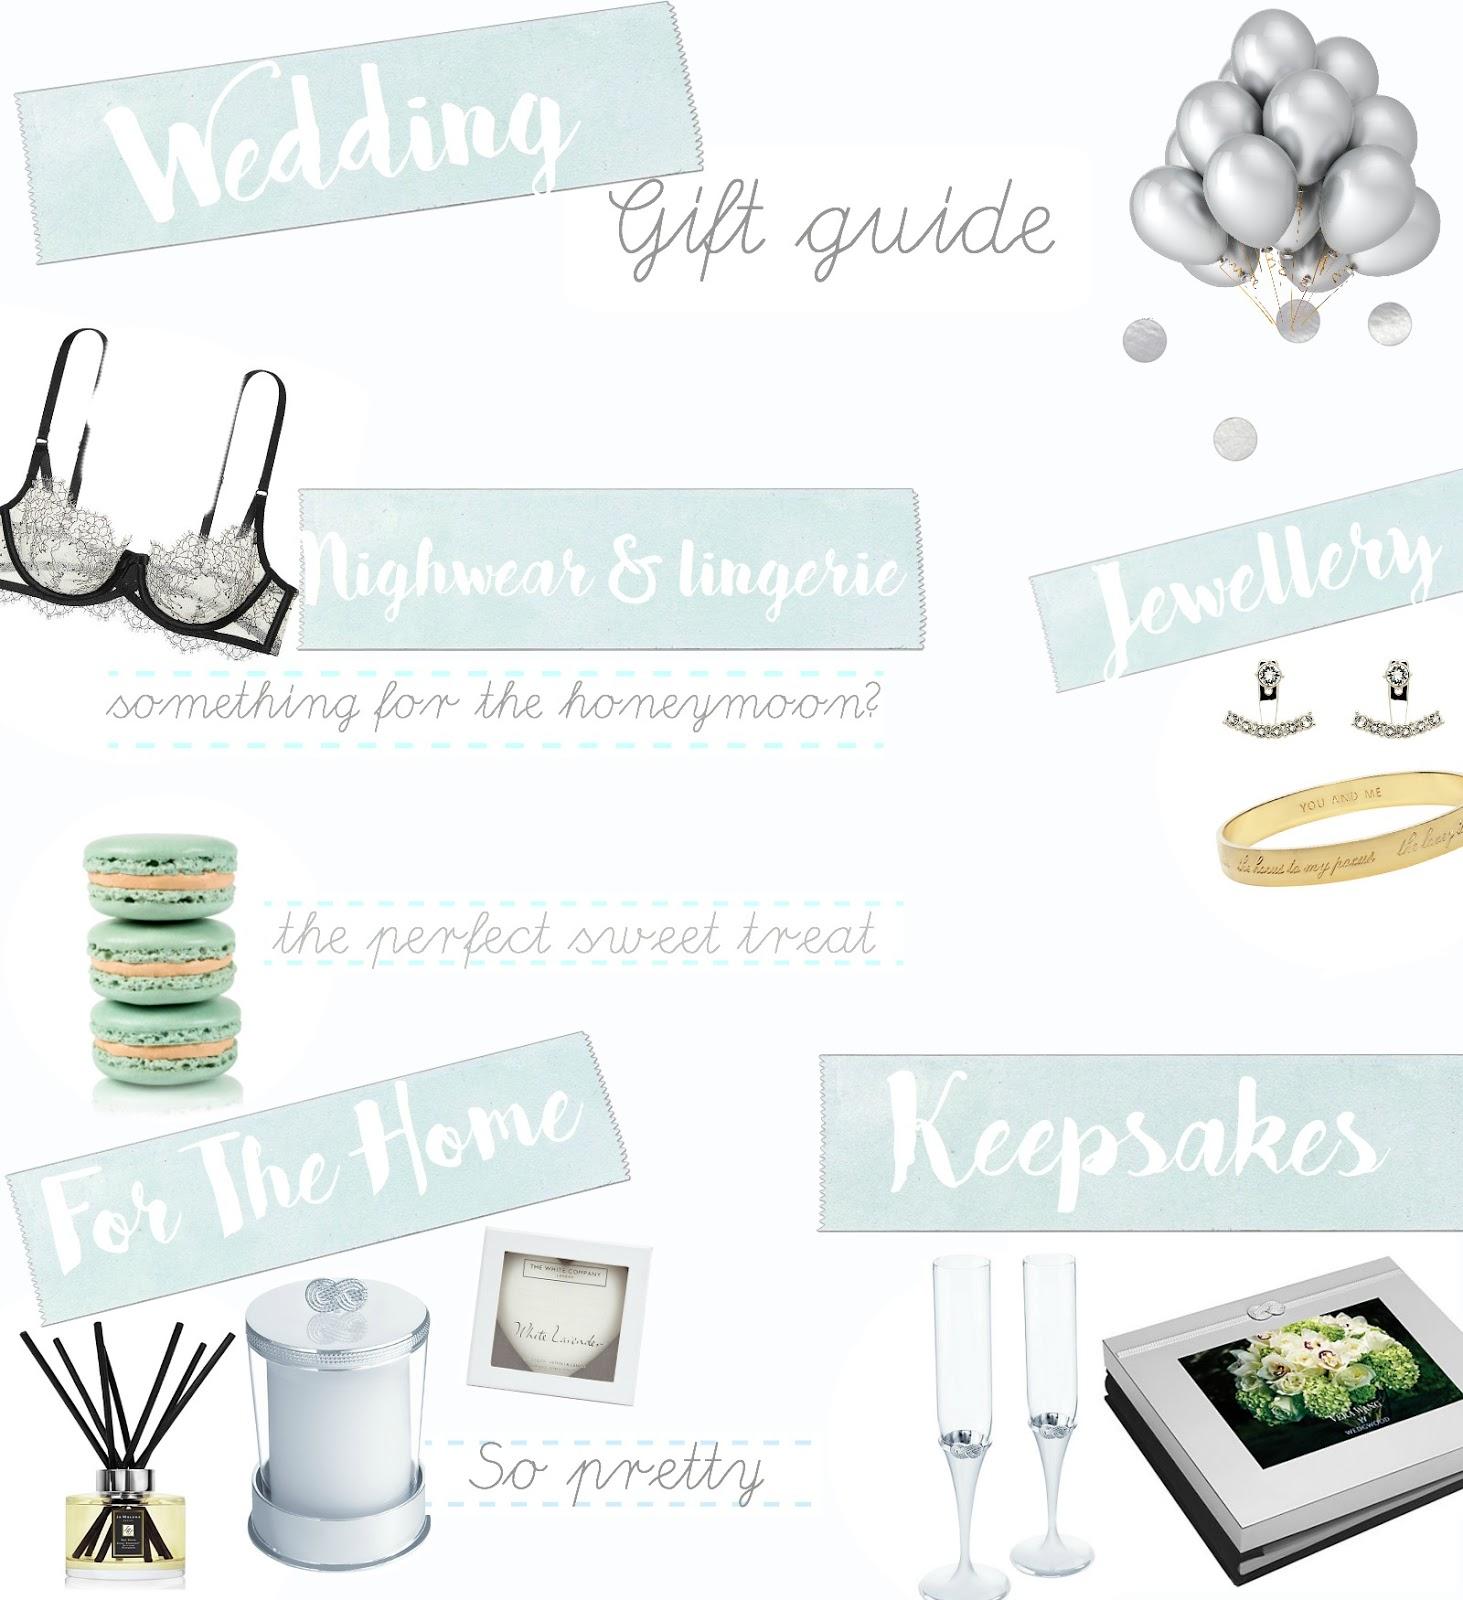 Wedding, Bridal, wedding gift guide, wedding presents, wedgwood, vera wang wedgwood, wedding presents, what to buy brides, victorias secret, etsy,